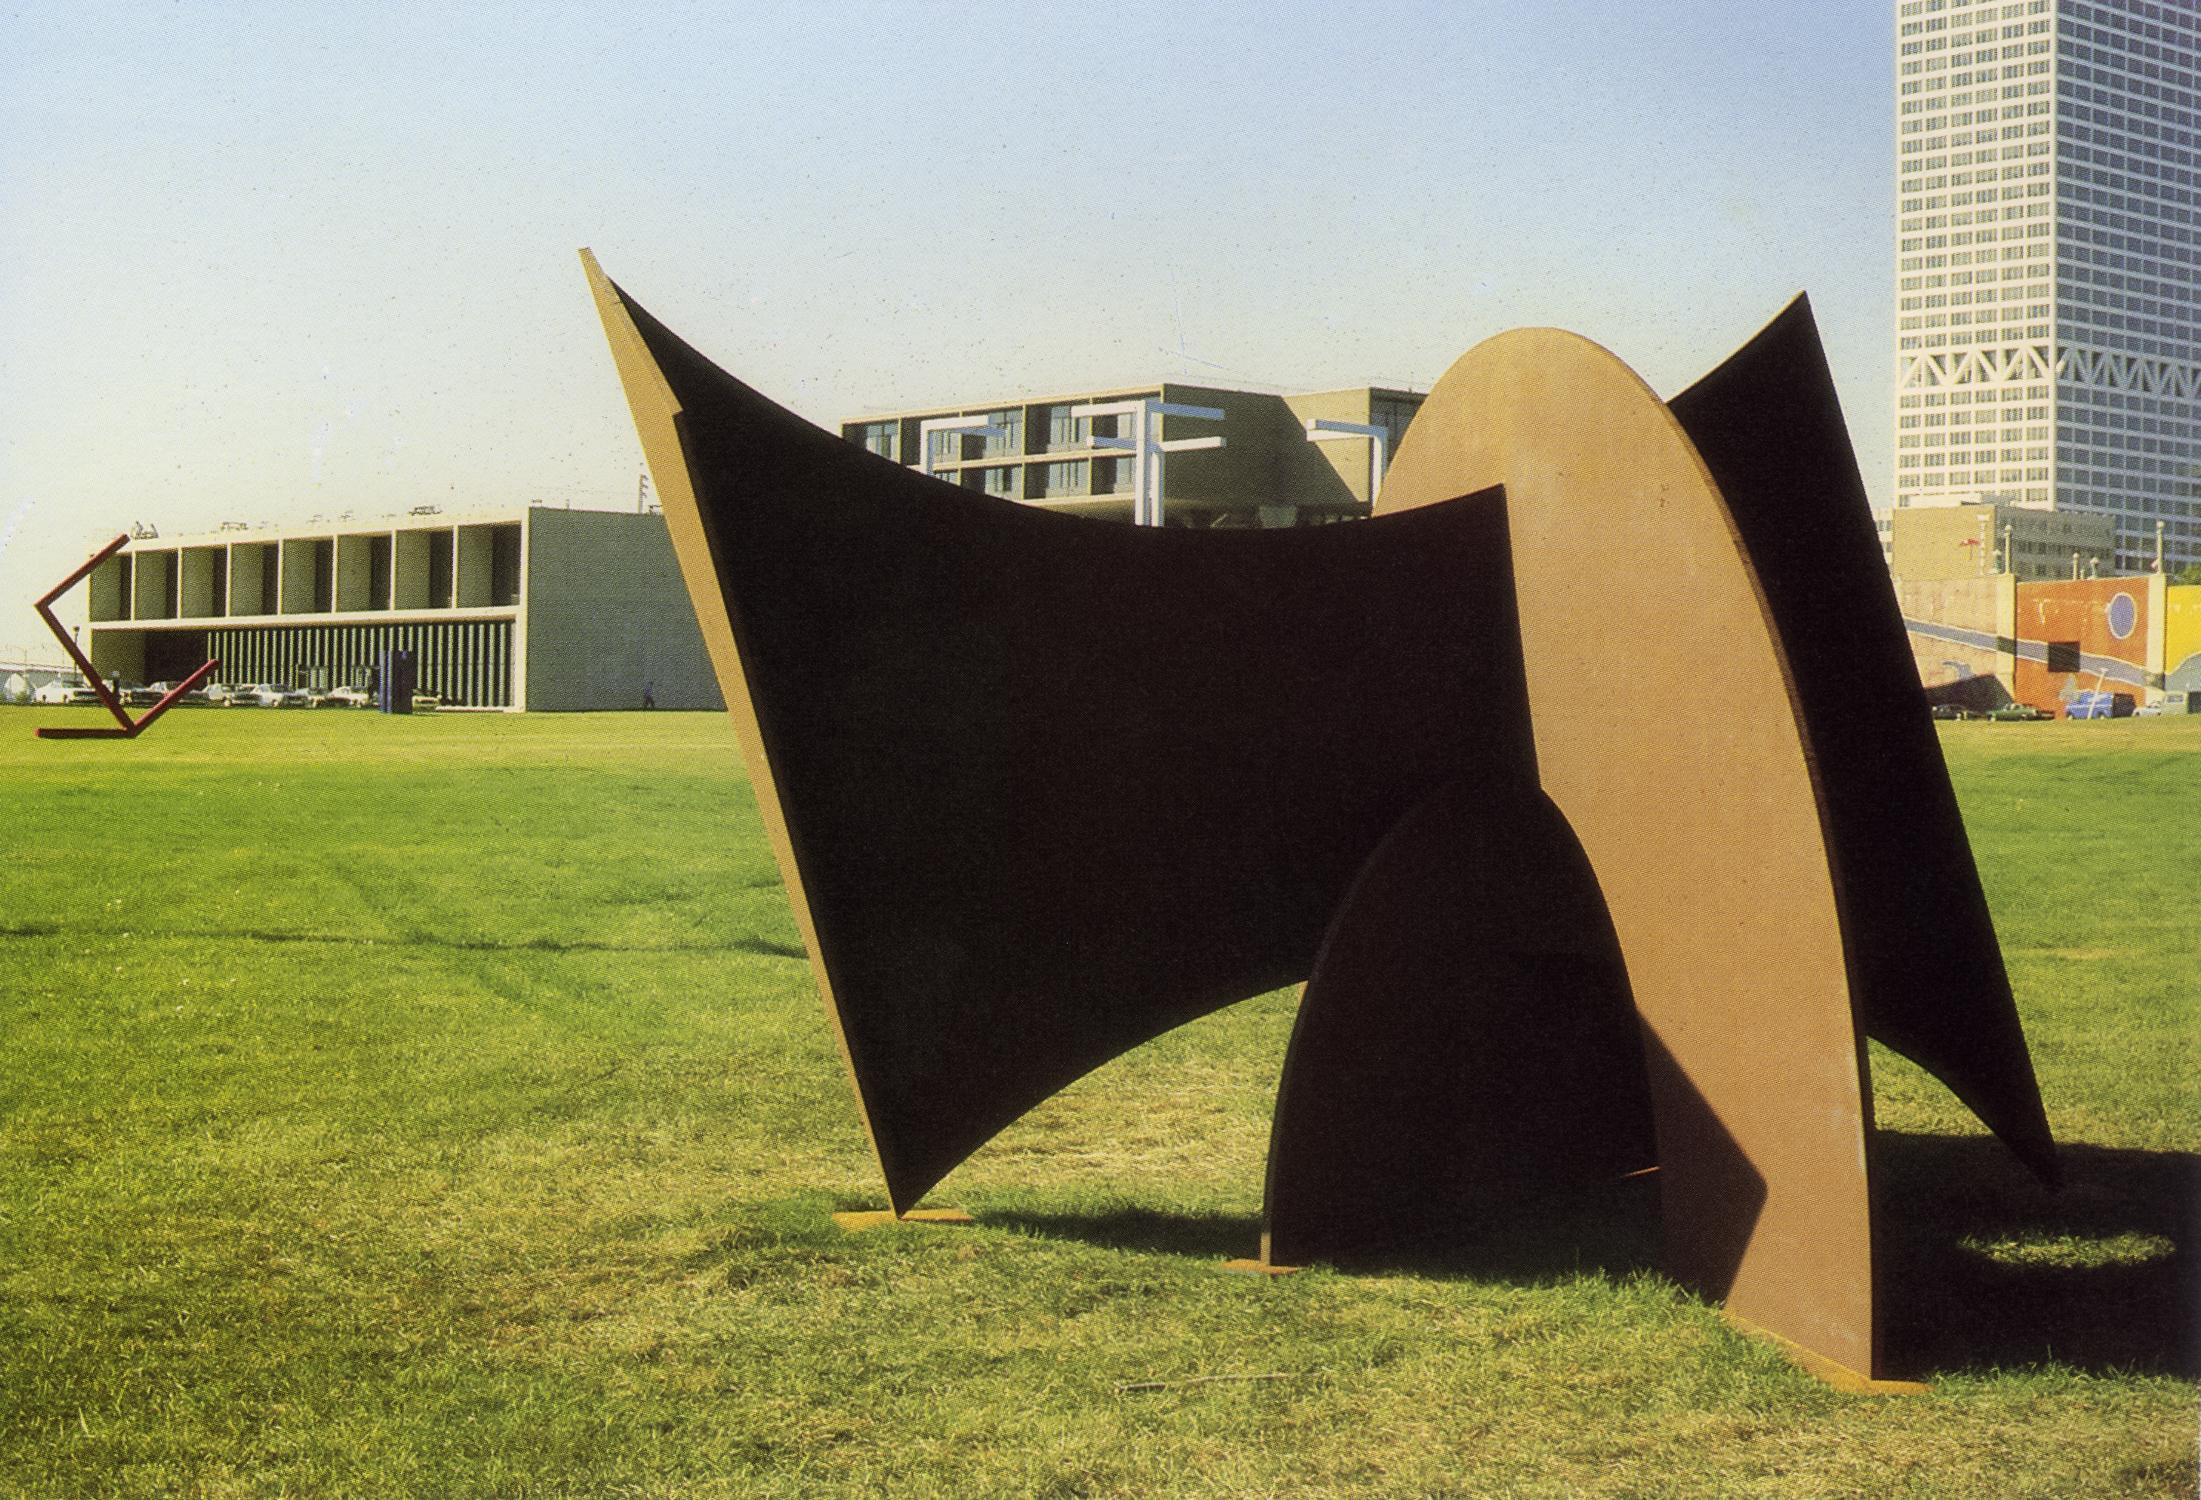 Milwaukee Art Museum, Milwaukee, Wisconsin; 1979.  M.H. III.  9' x 16' x 12'.